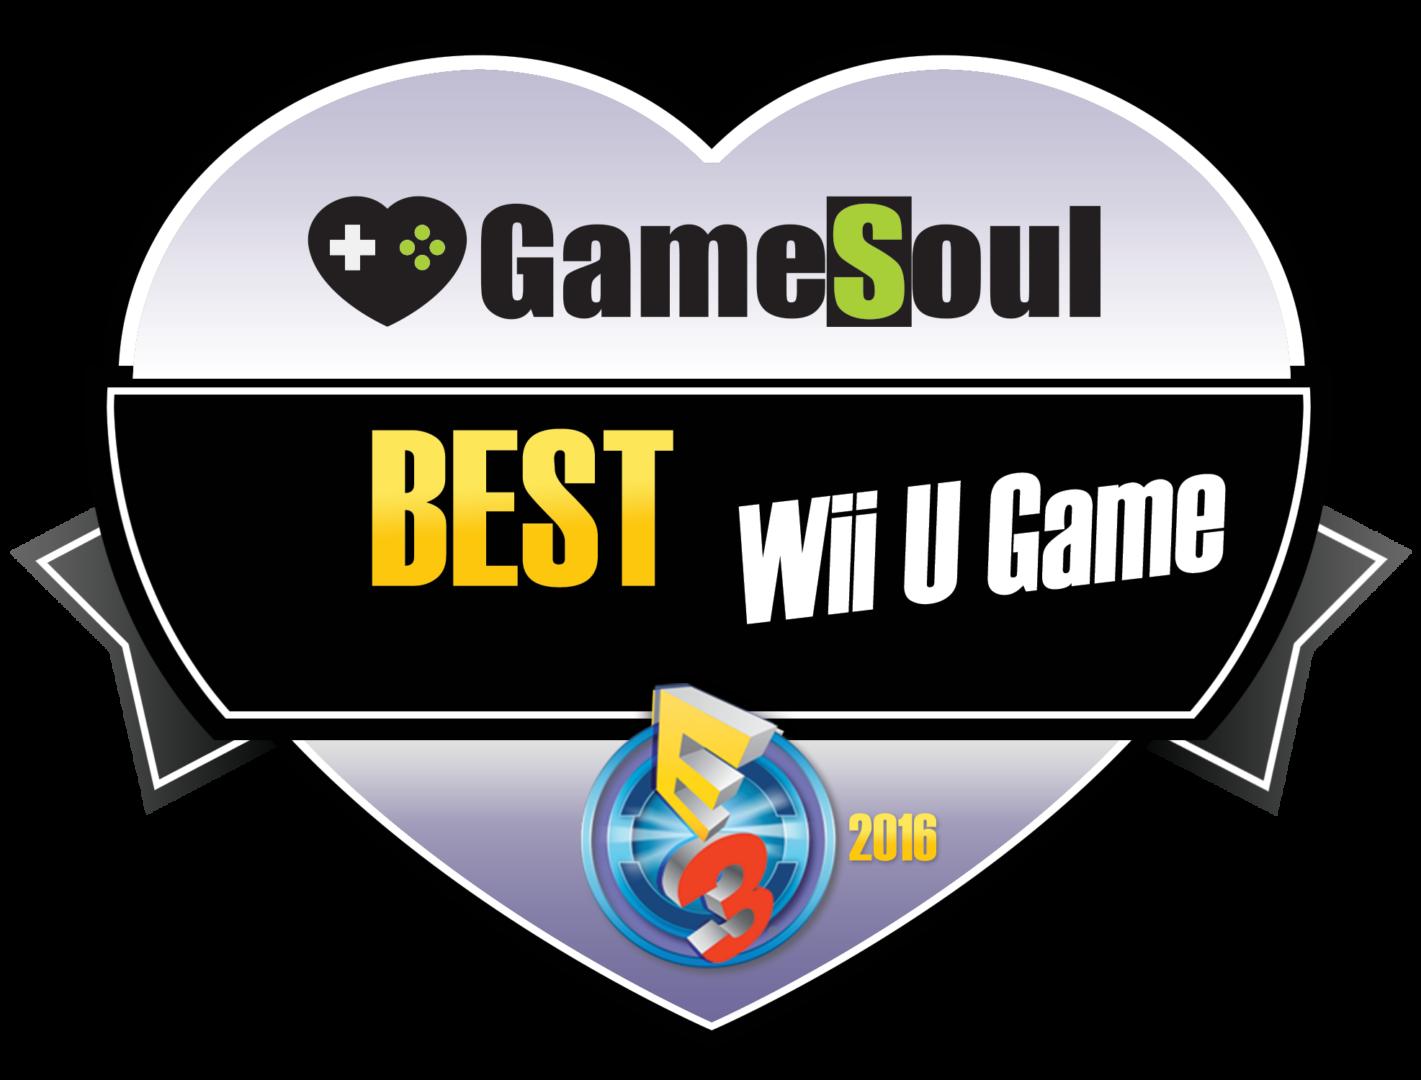 Best-Wii-U-Game